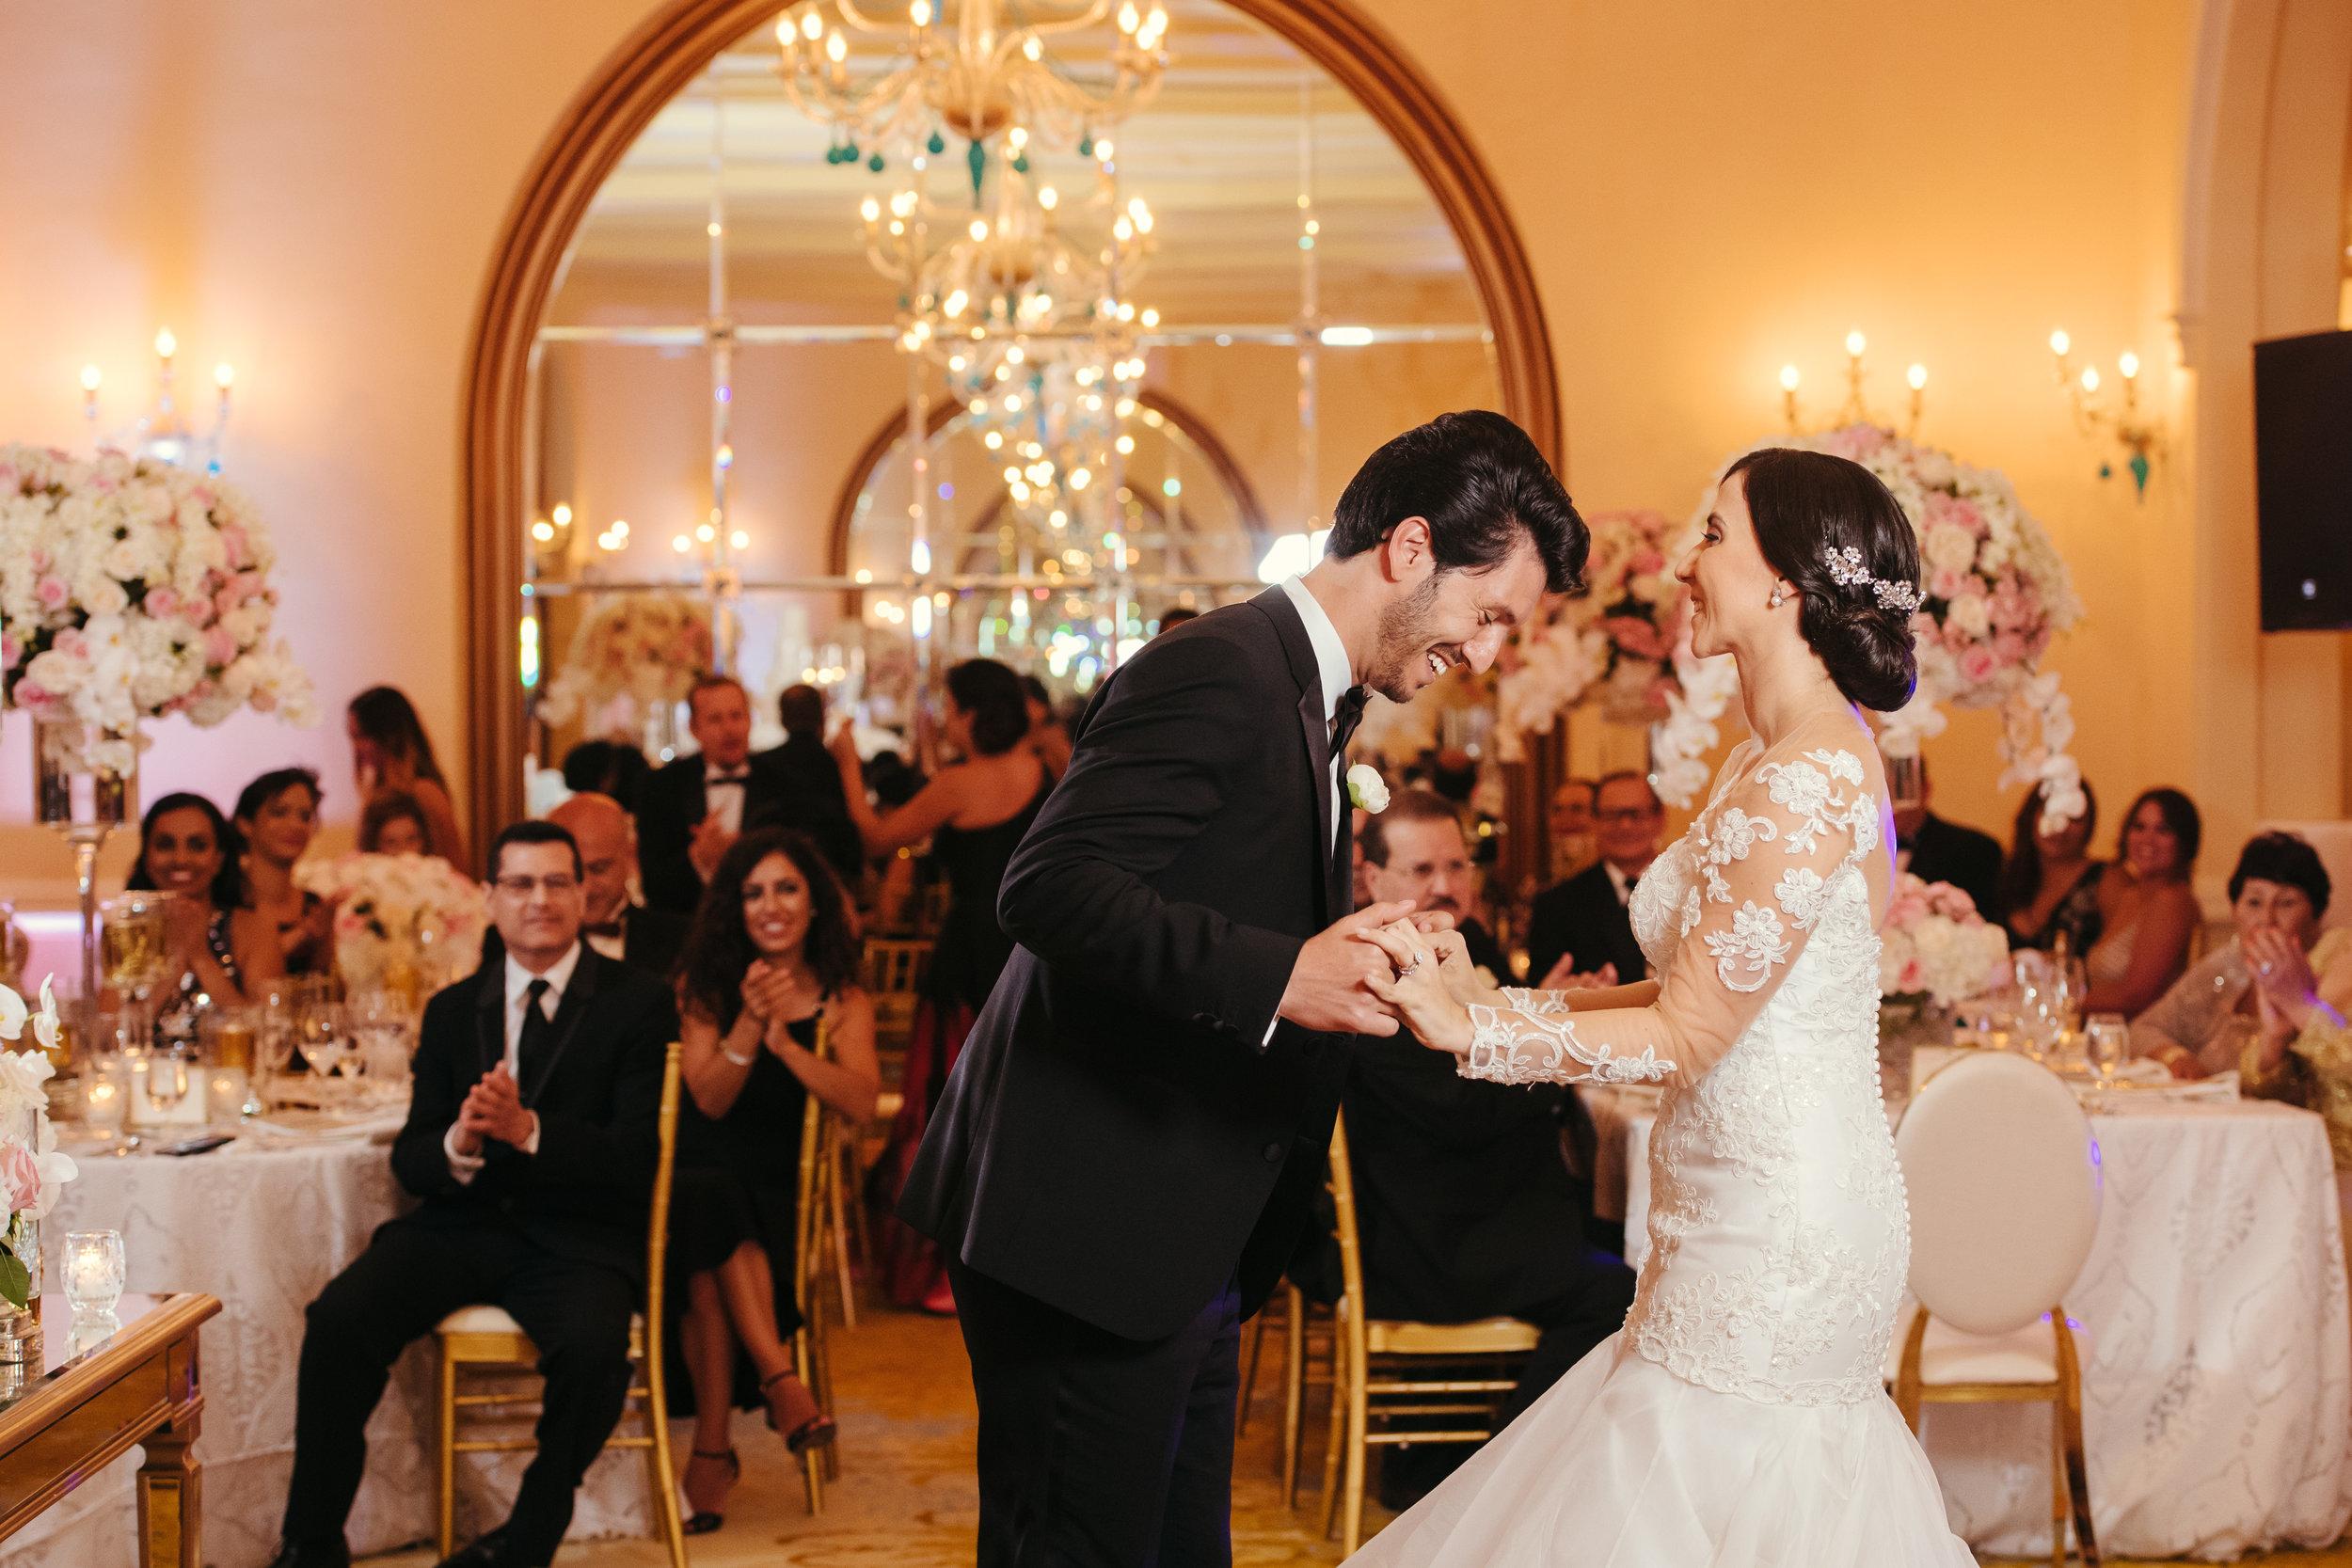 Lisgelia&Ahmed_Wedding_305.jpg